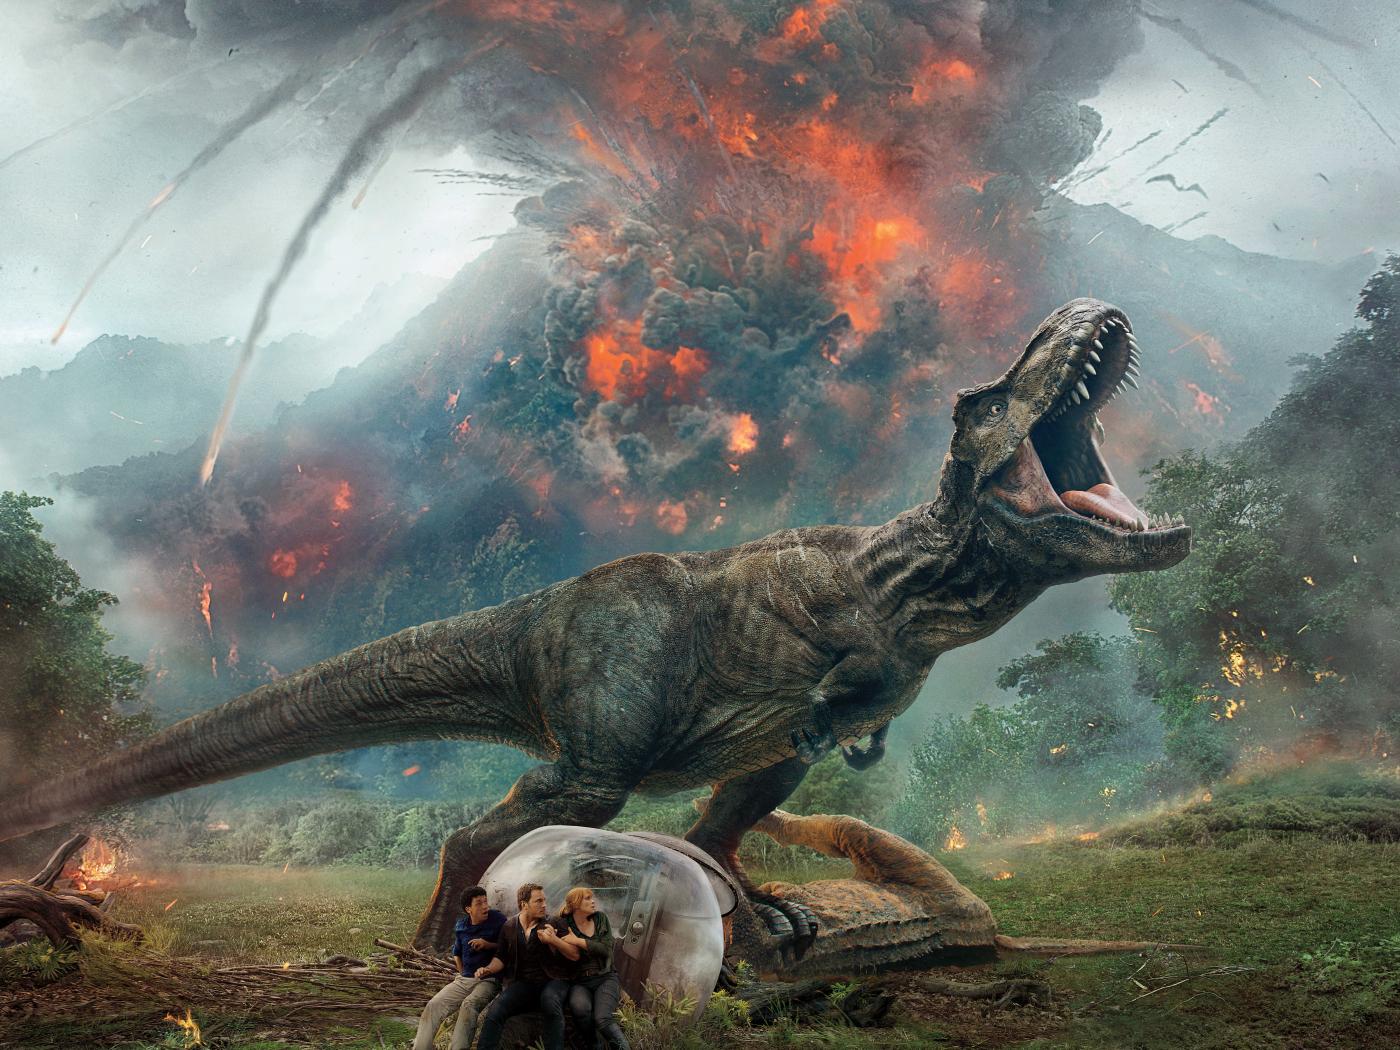 Jurassic world fallen kingdom 2018 movie poster full hd - Movie poster wallpaper ...